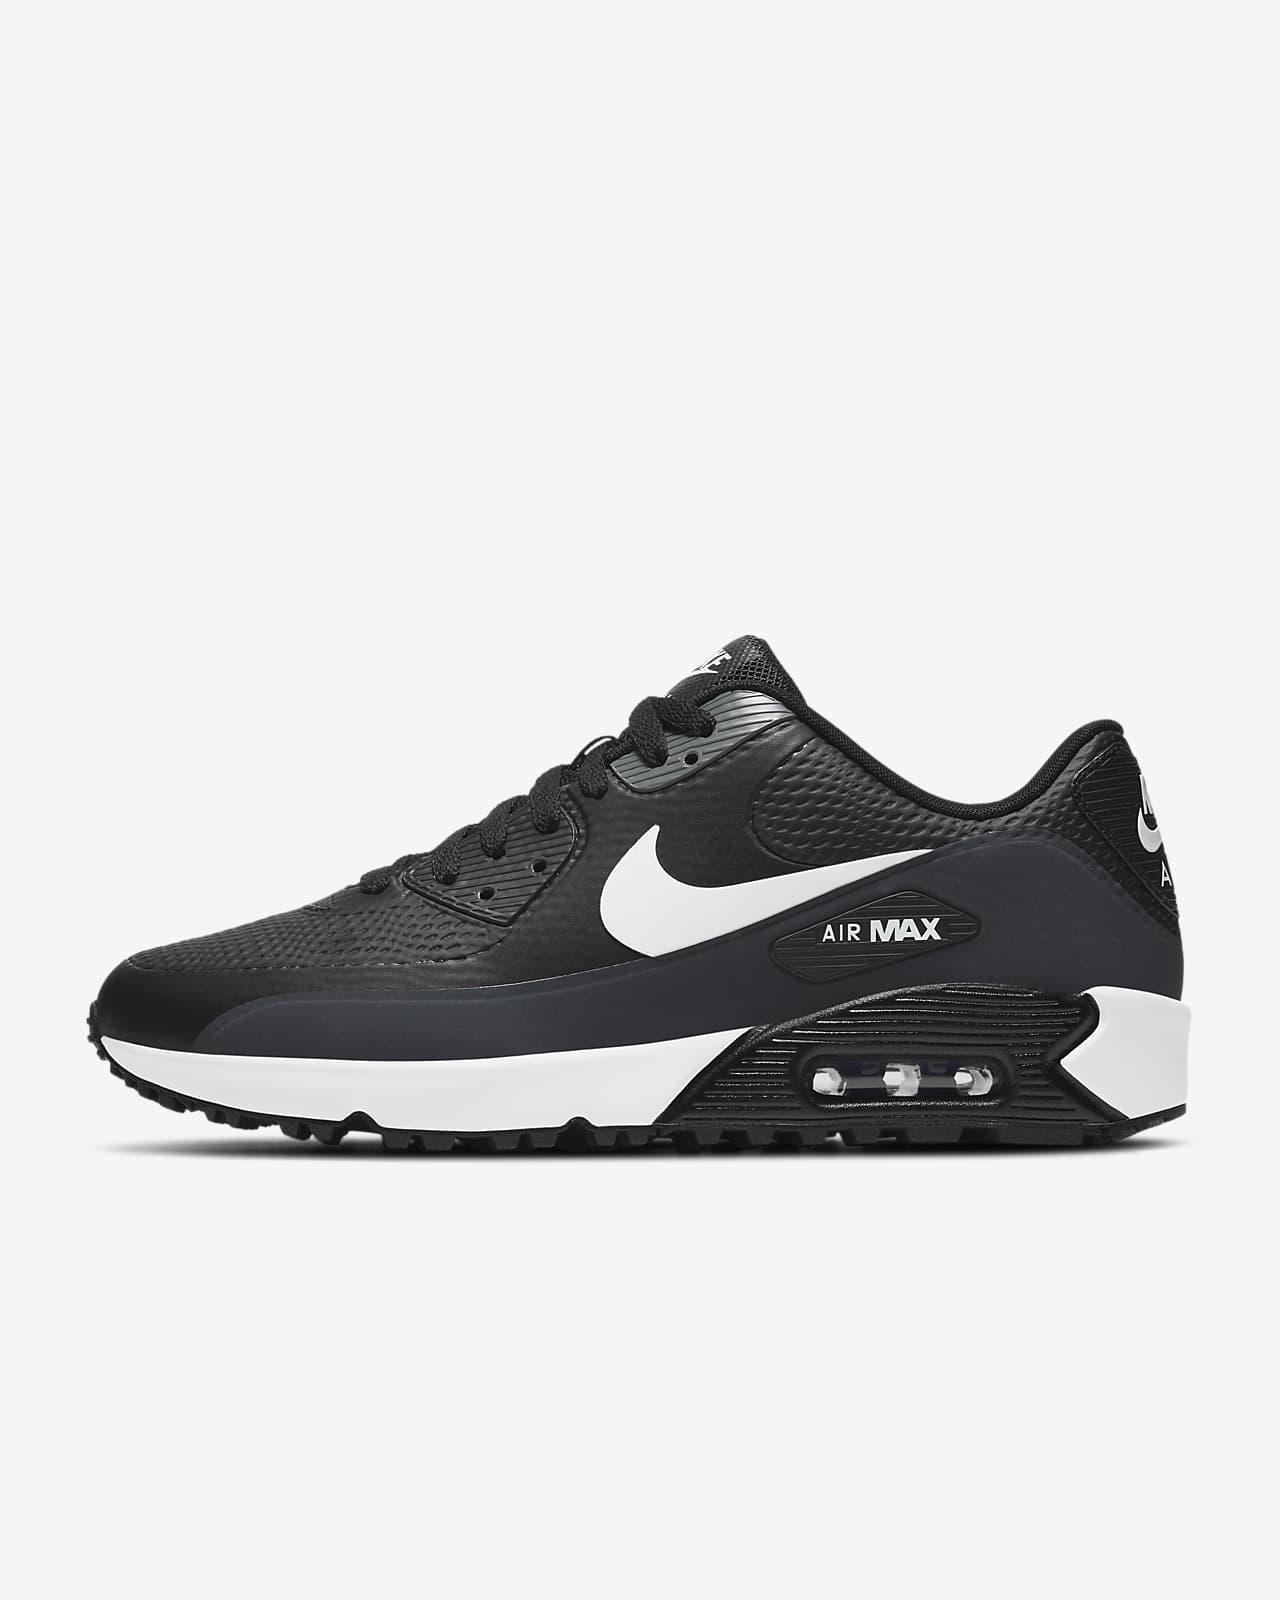 Nike Air Max 90 G Golf Shoe. Nike LU